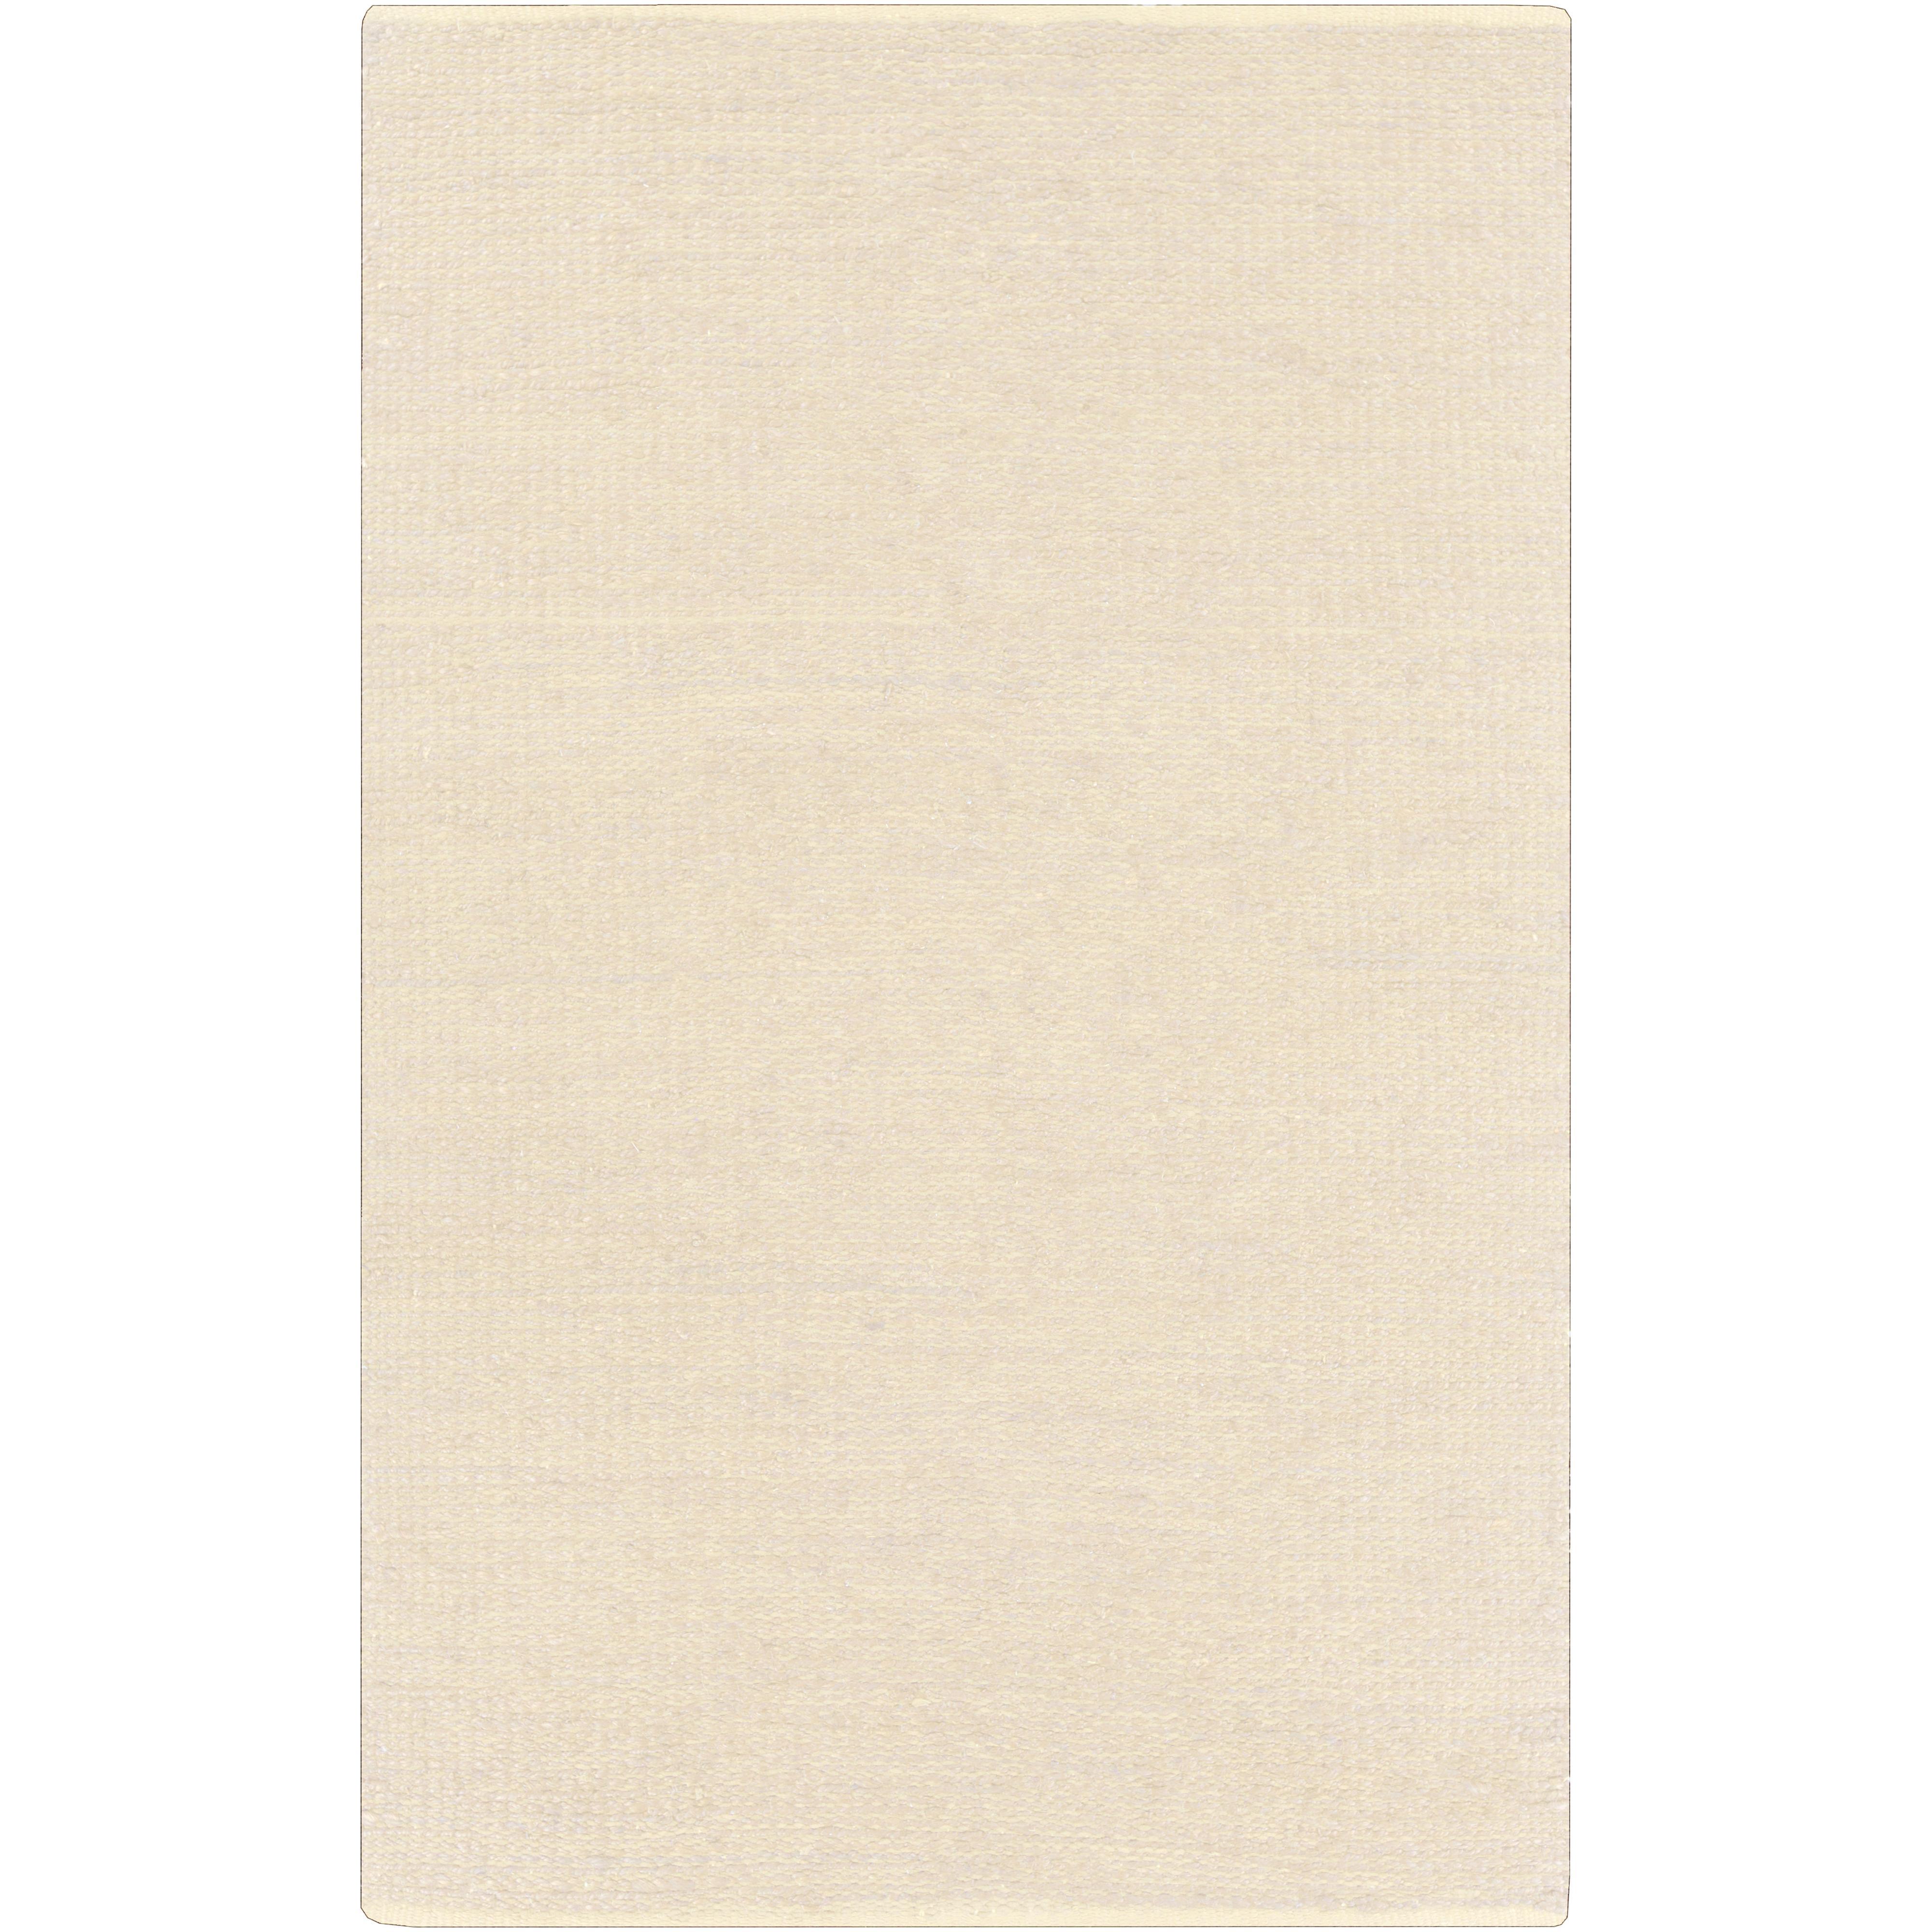 "Surya Rugs Tonga 3'6"" x 5'6"" - Item Number: TGA6005-3656"